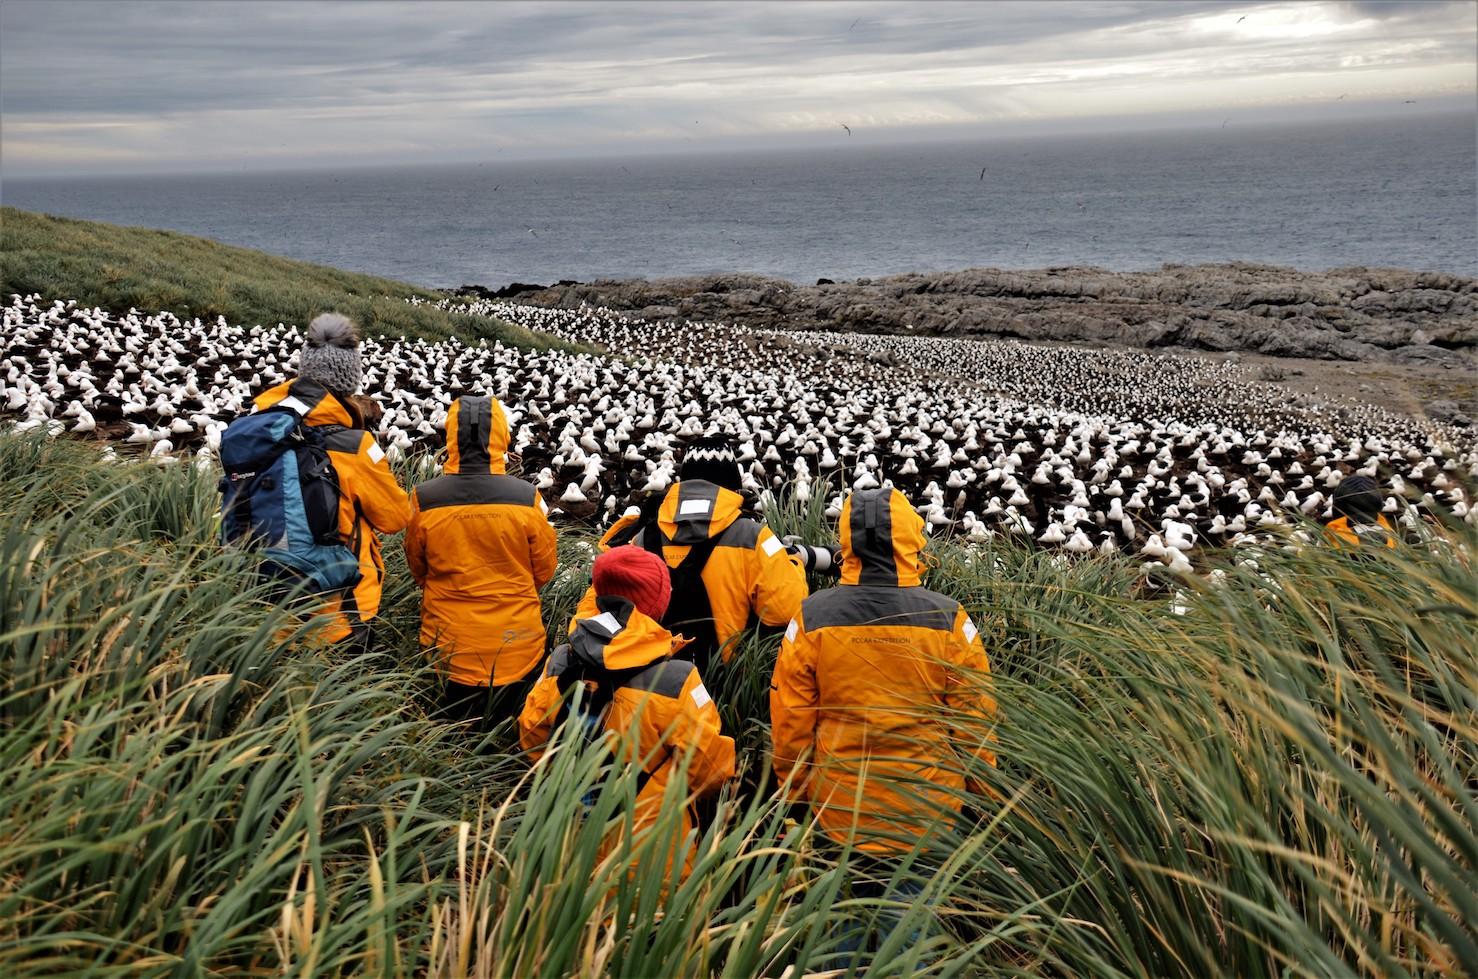 Quark's Ocean Adventurer passengers marvel at the spectacle of thousands of black-browed albatross nesting on Steeple Jason, in the Falkland Islands. Photo Manda Lundström